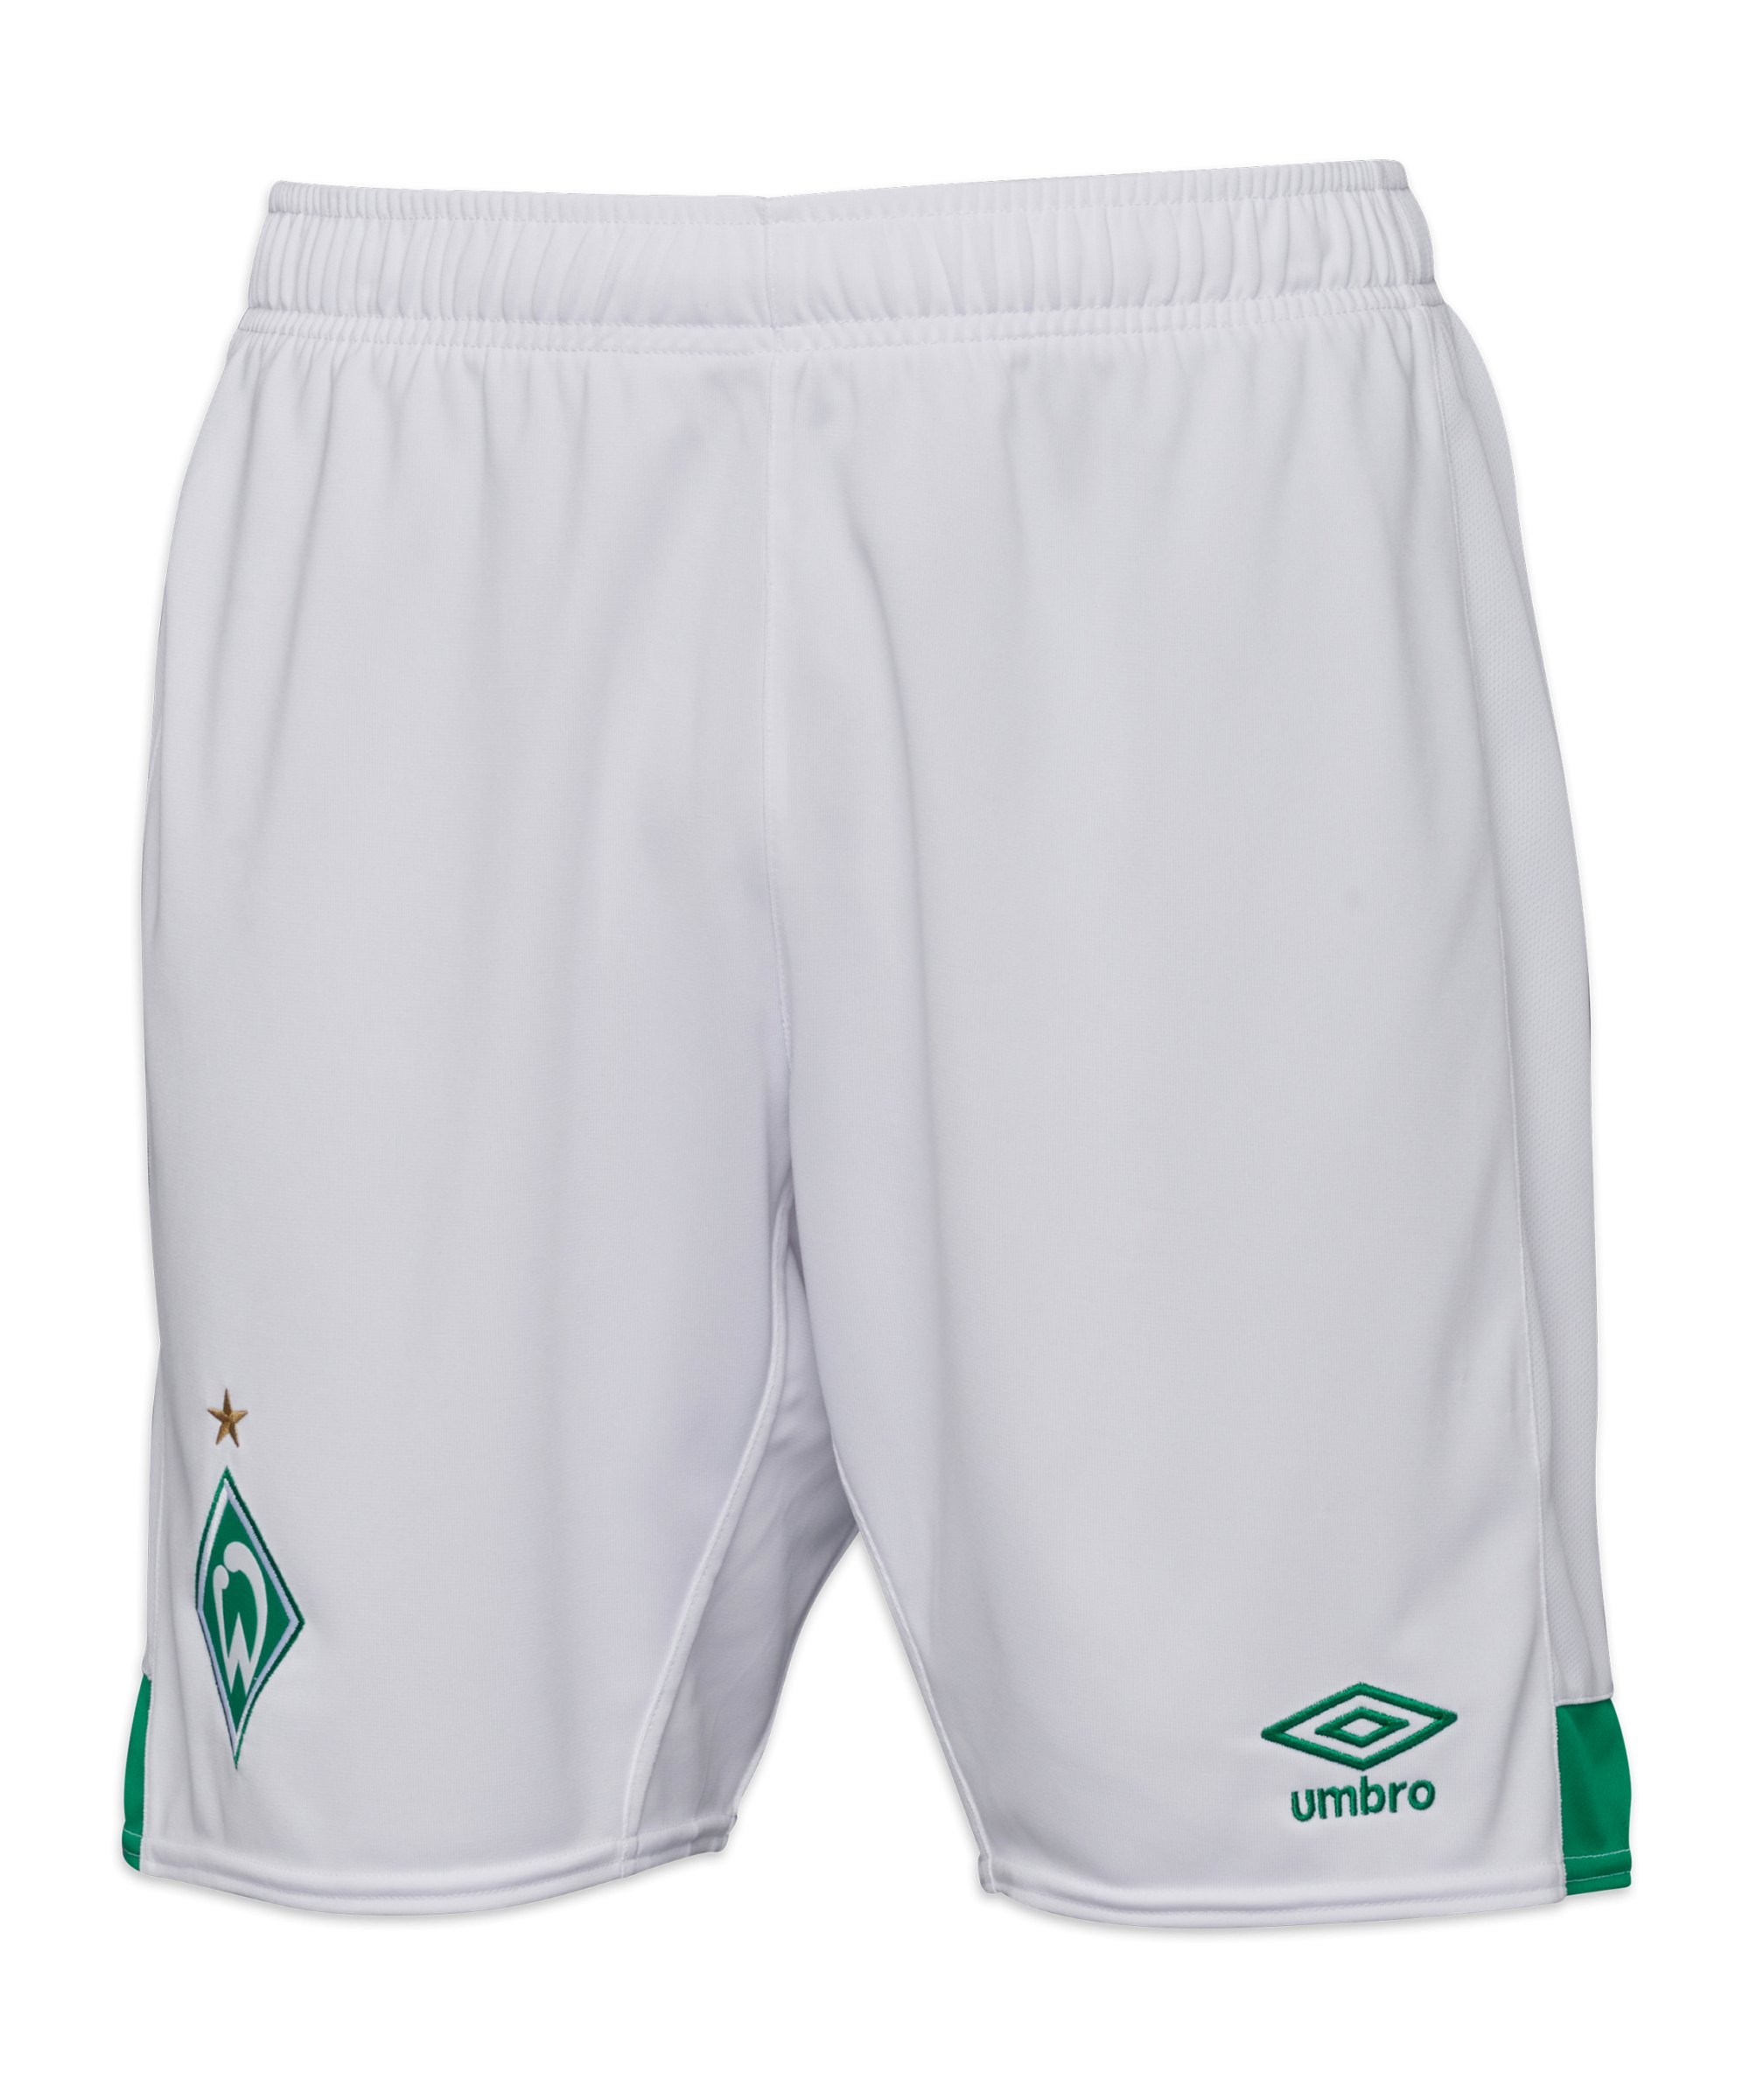 Umbro SV Werder Bremen Short Home 2021/2022 Kids Weiss - weiss